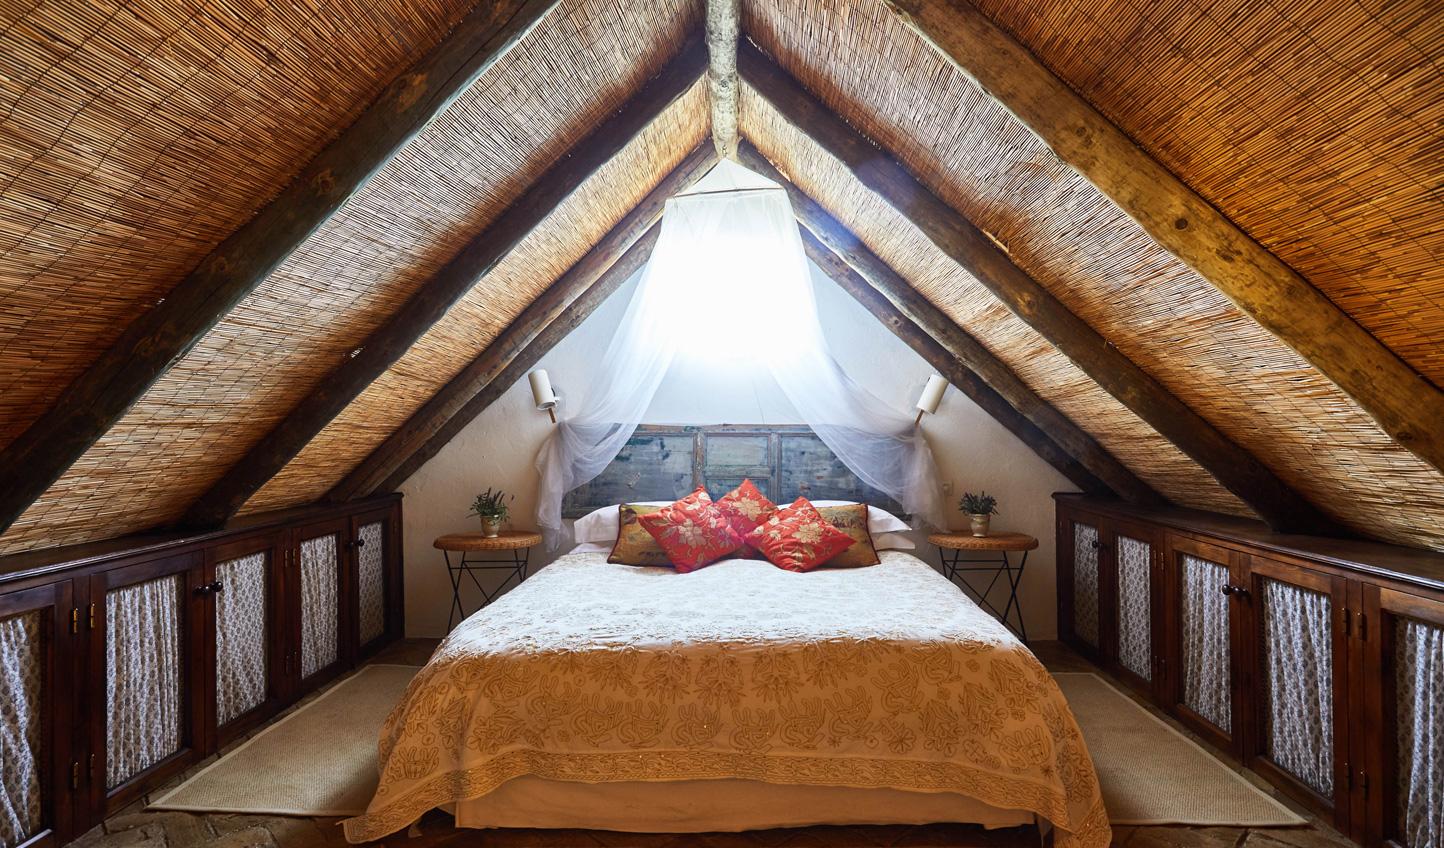 Sleep beneath the eaves